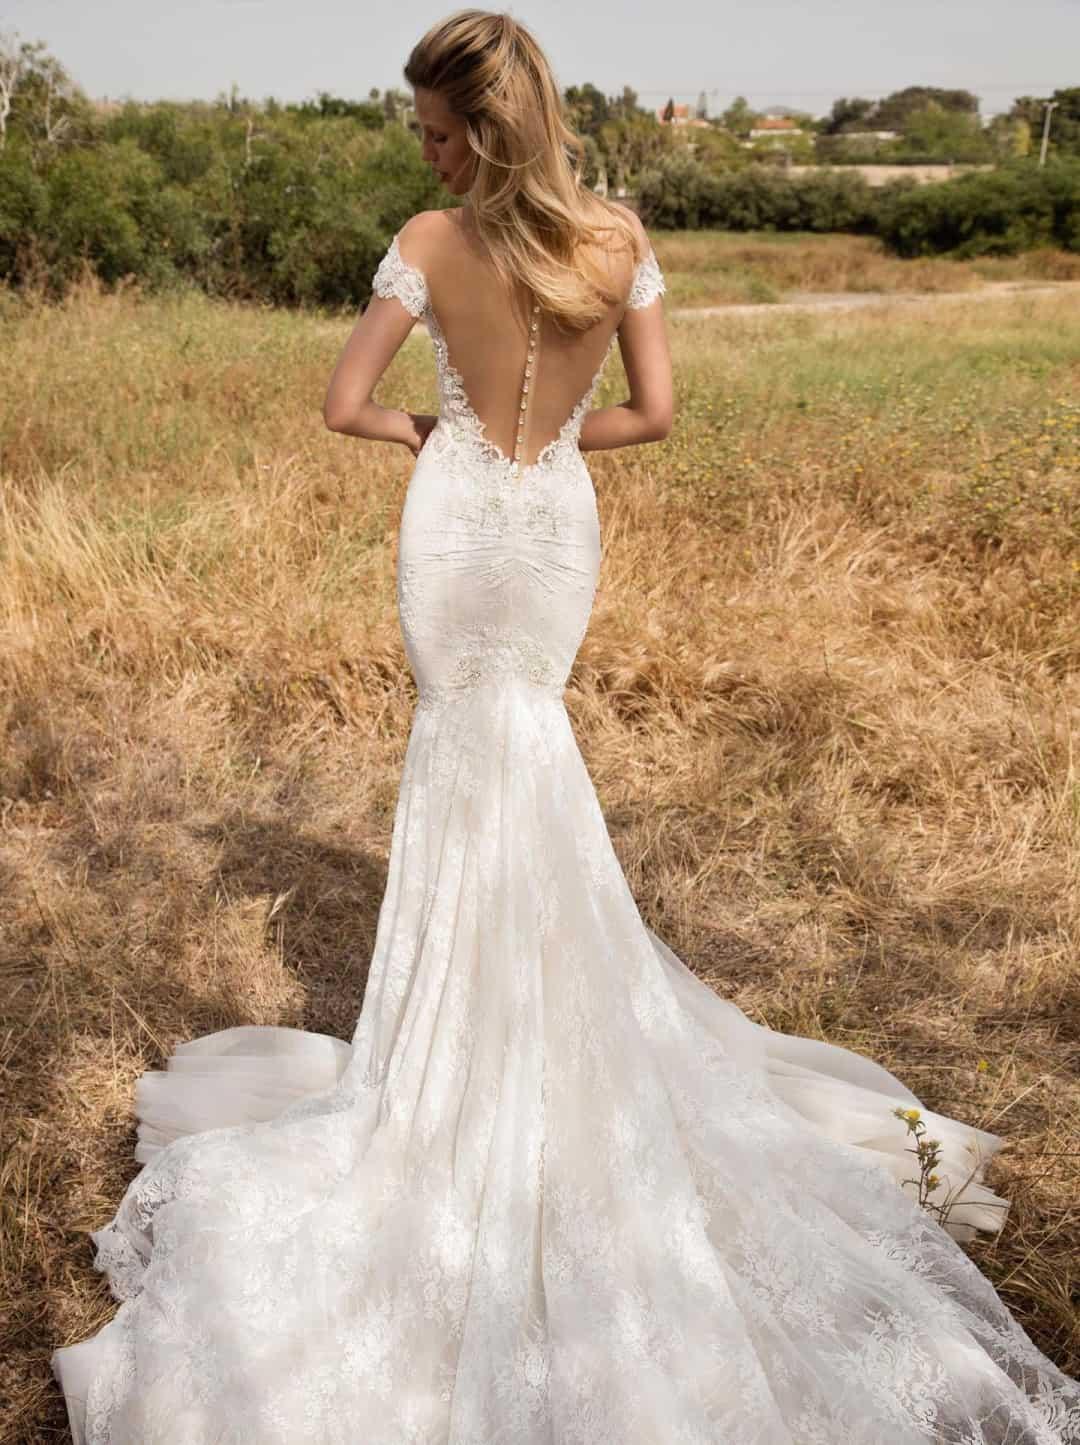 Haute Couture Brautkleider - Gala-702-back-1-1440x1926